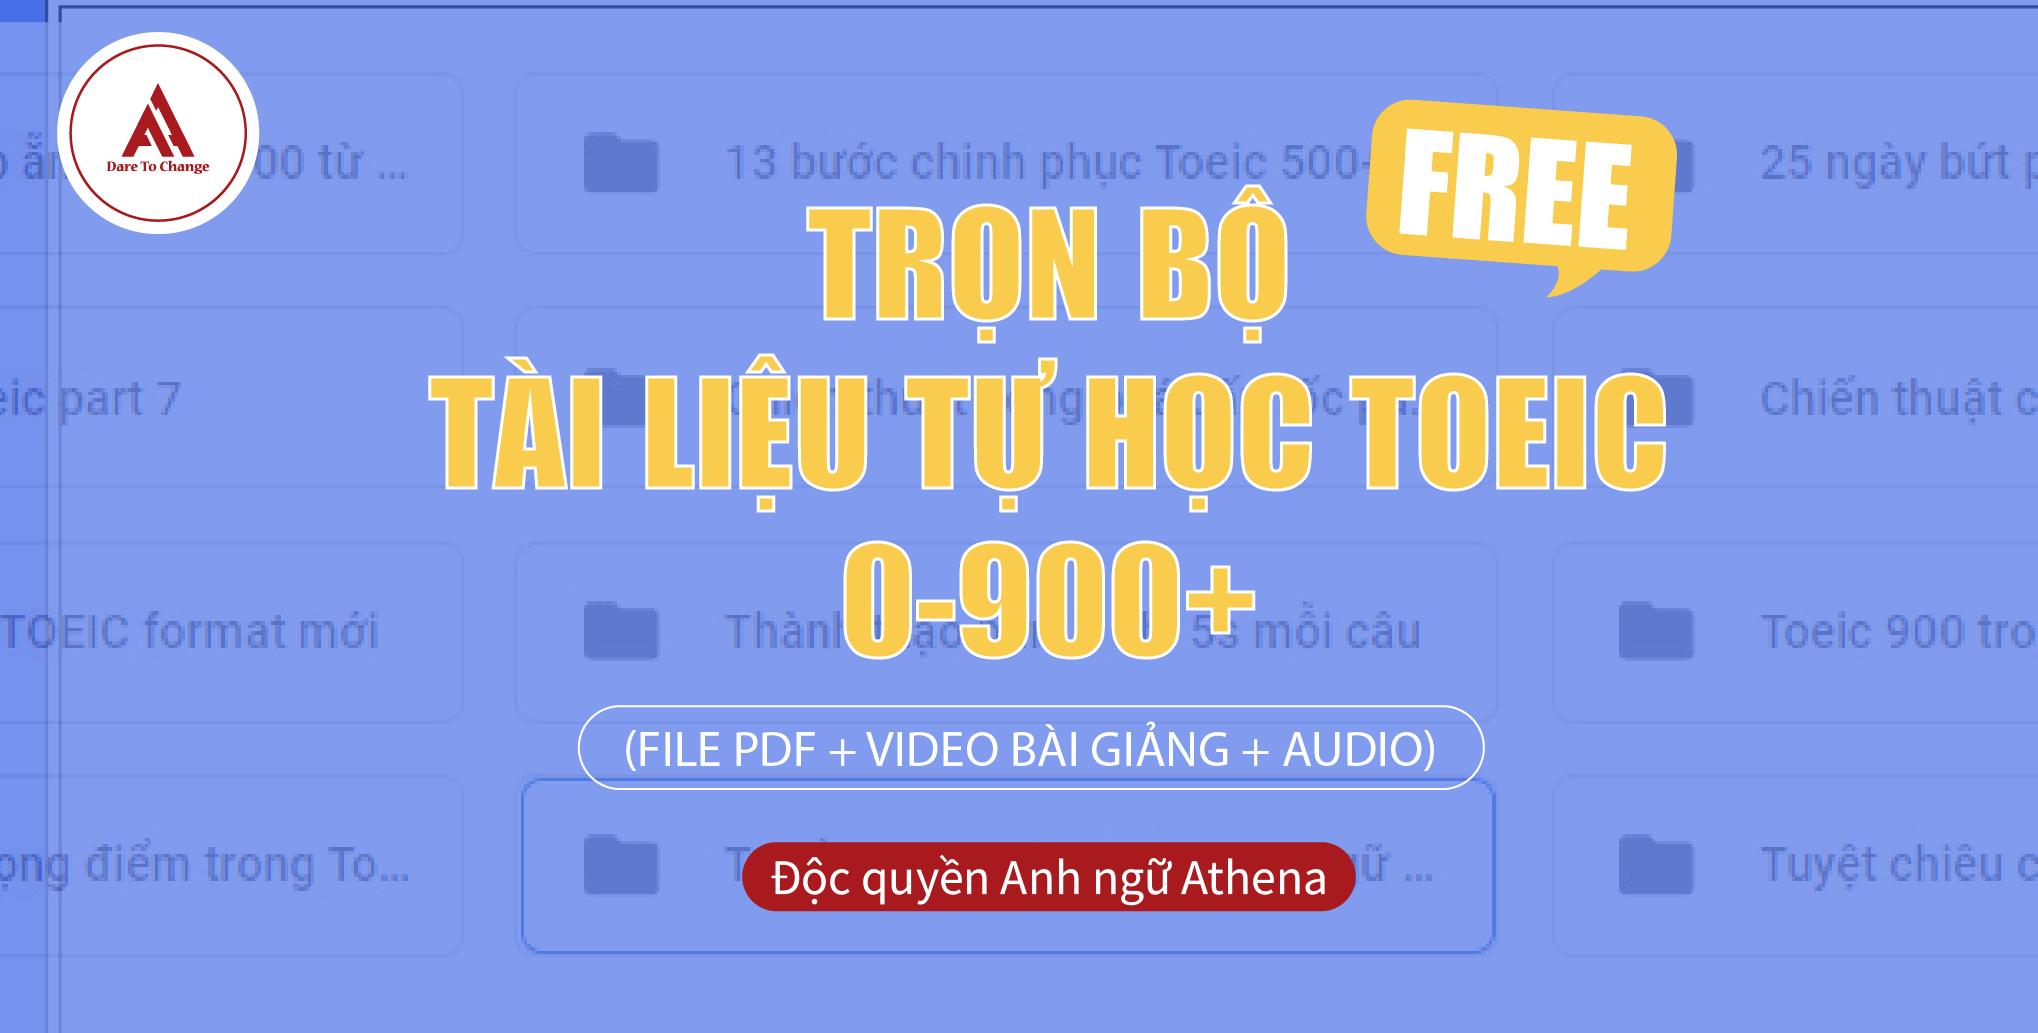 TRỌN BỘ TÀI LIỆU TỰ HỌC TOEIC 0-900+ (FILE PDF + VIDEO BÀI GIẢNG + AUDIO)